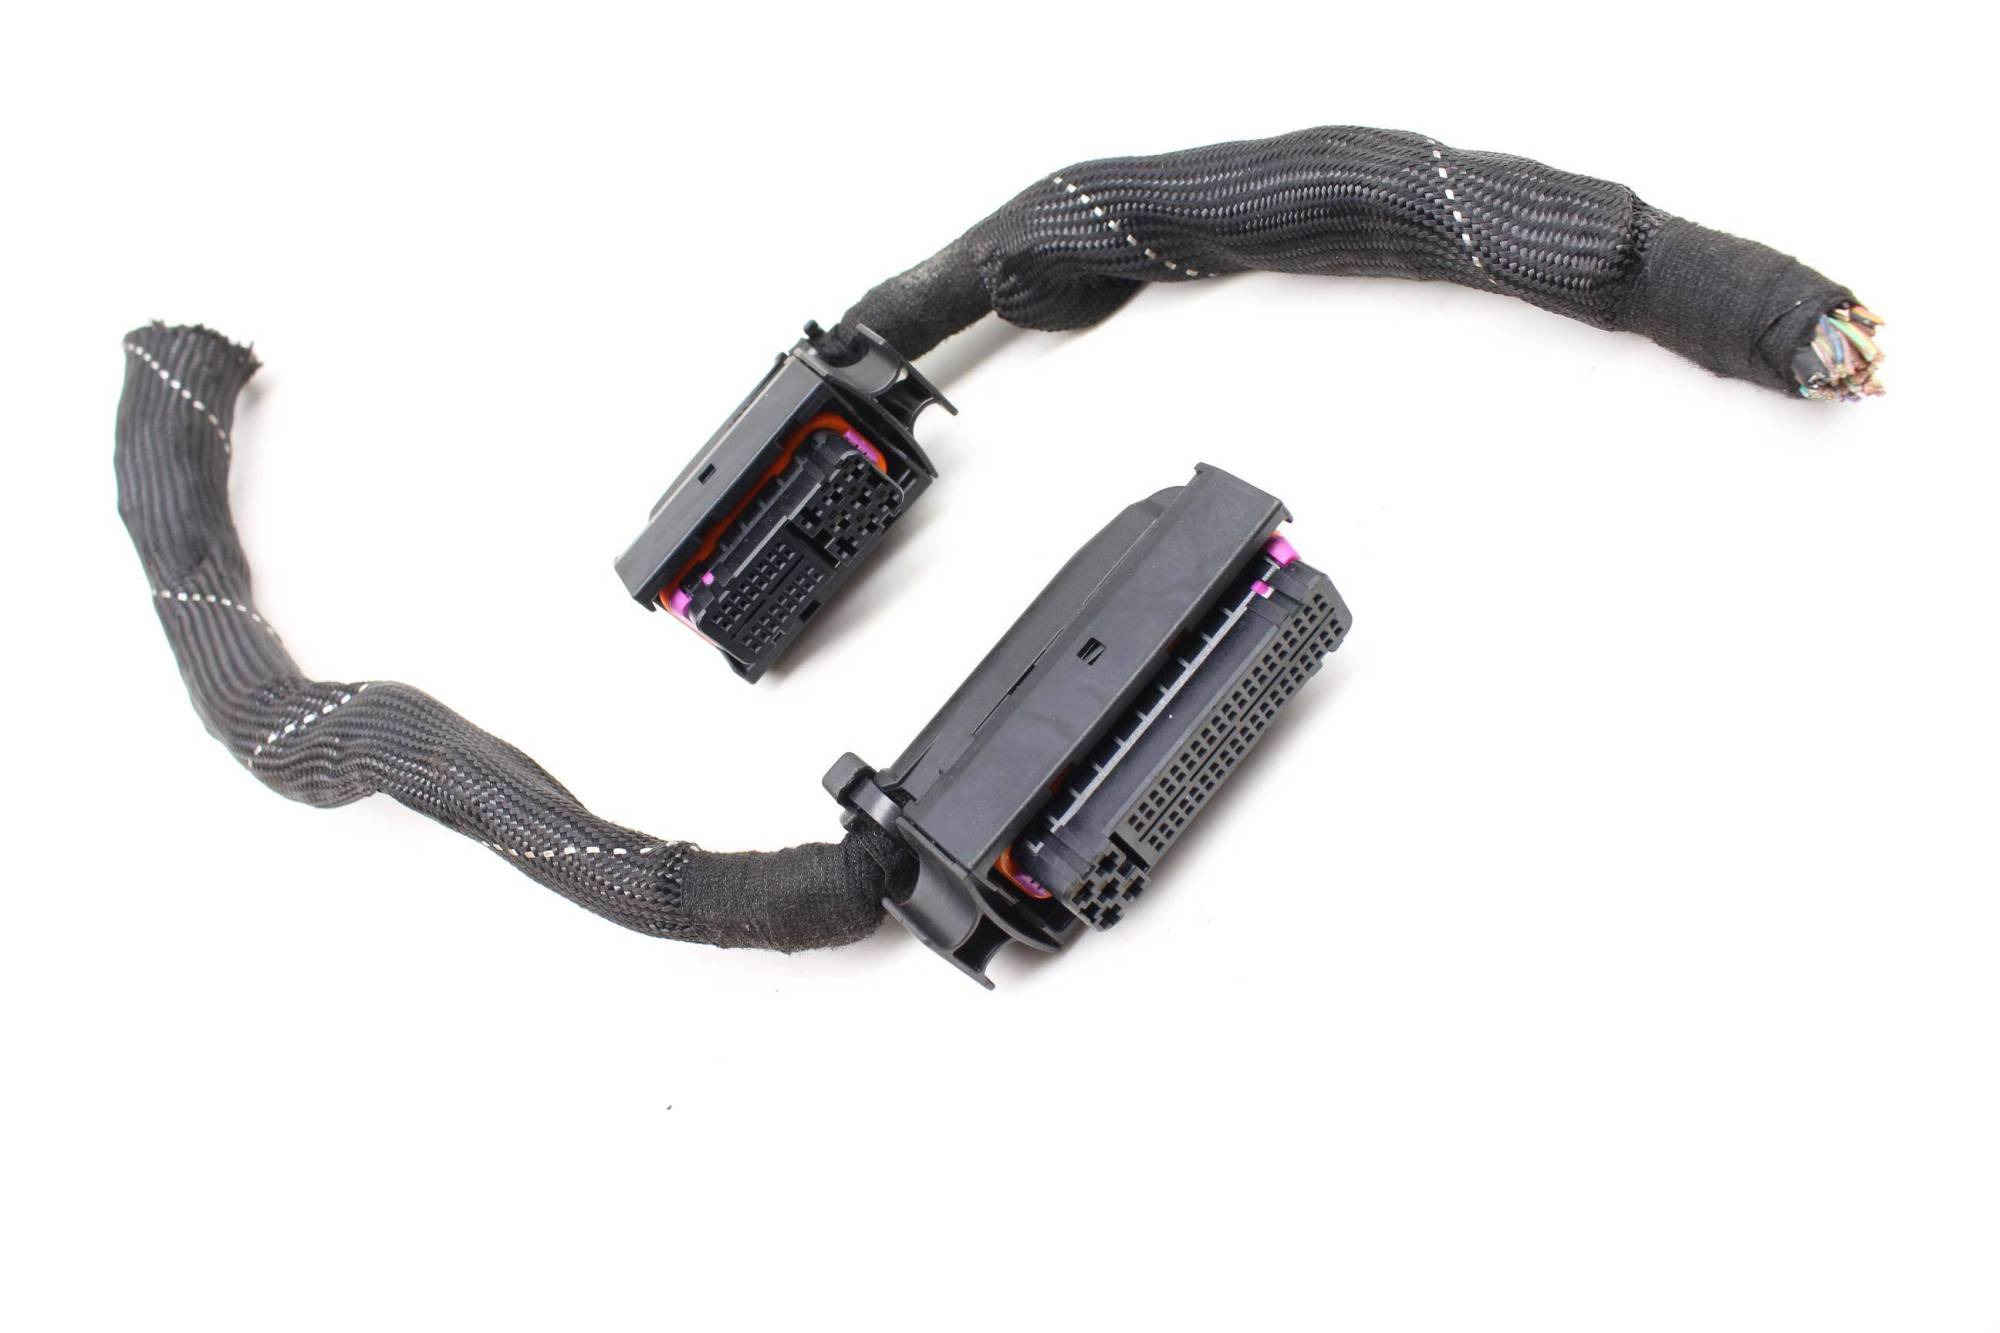 hight resolution of 05 audi s4 b6 4 2l ecu engine control module wiring harness connector set